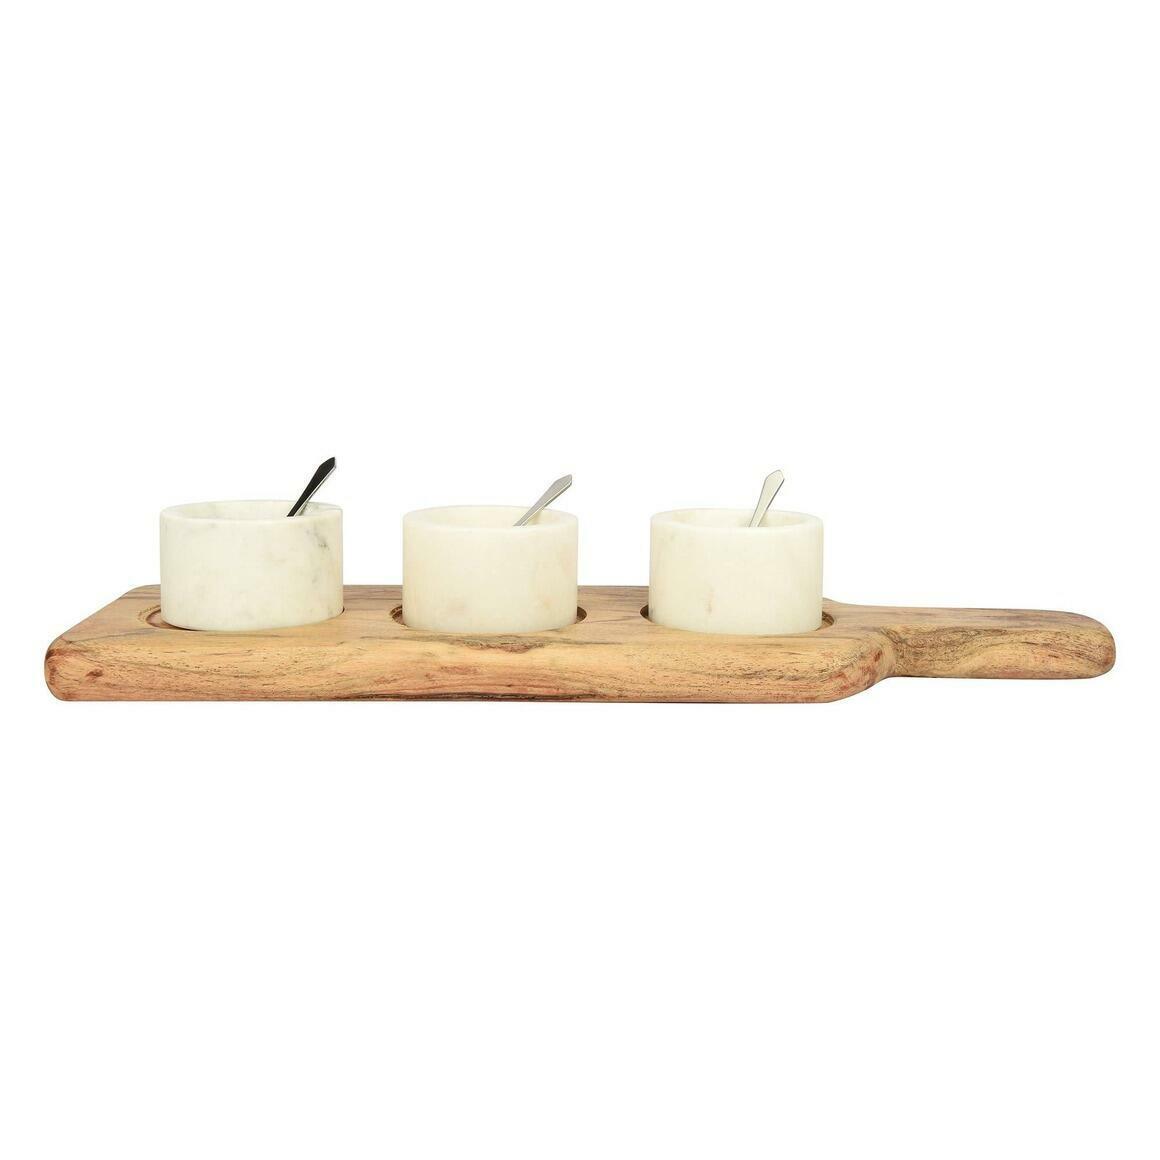 "Junia Marble Bowls on Wooden Platter (15""x4.75"")   Trada Marketplace"